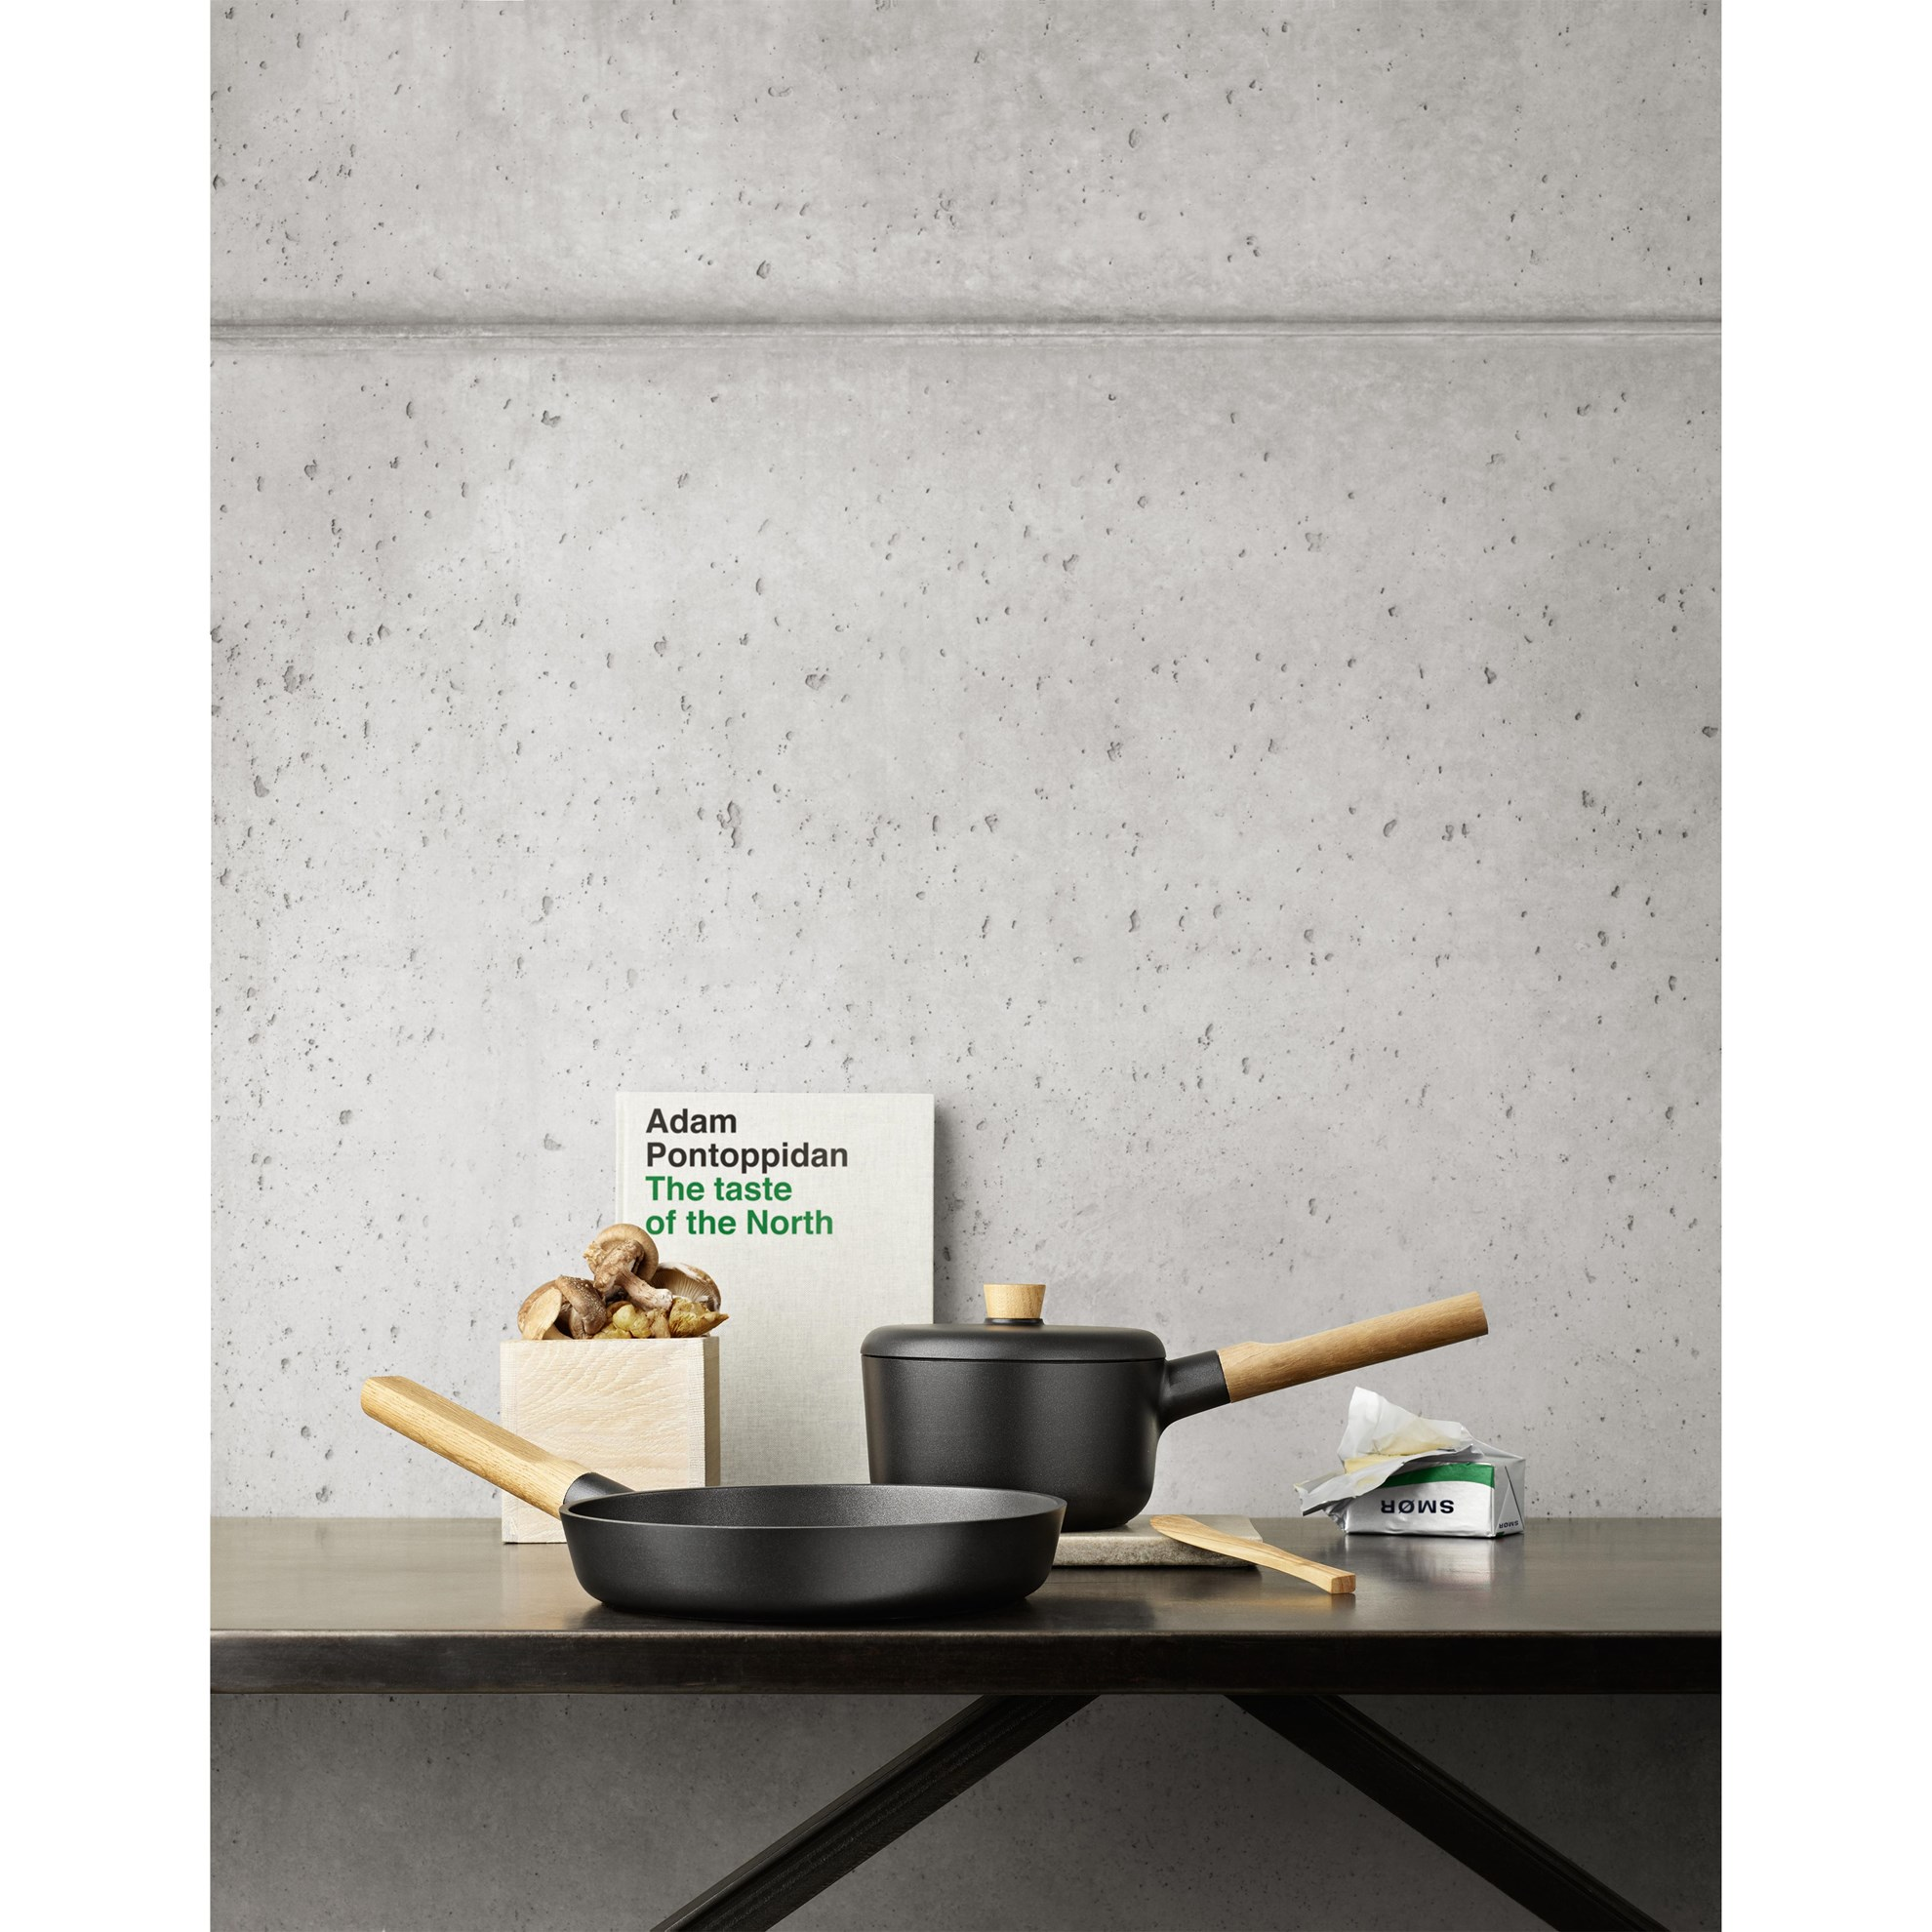 Pánev 24 cm Nordic Kitchen_2